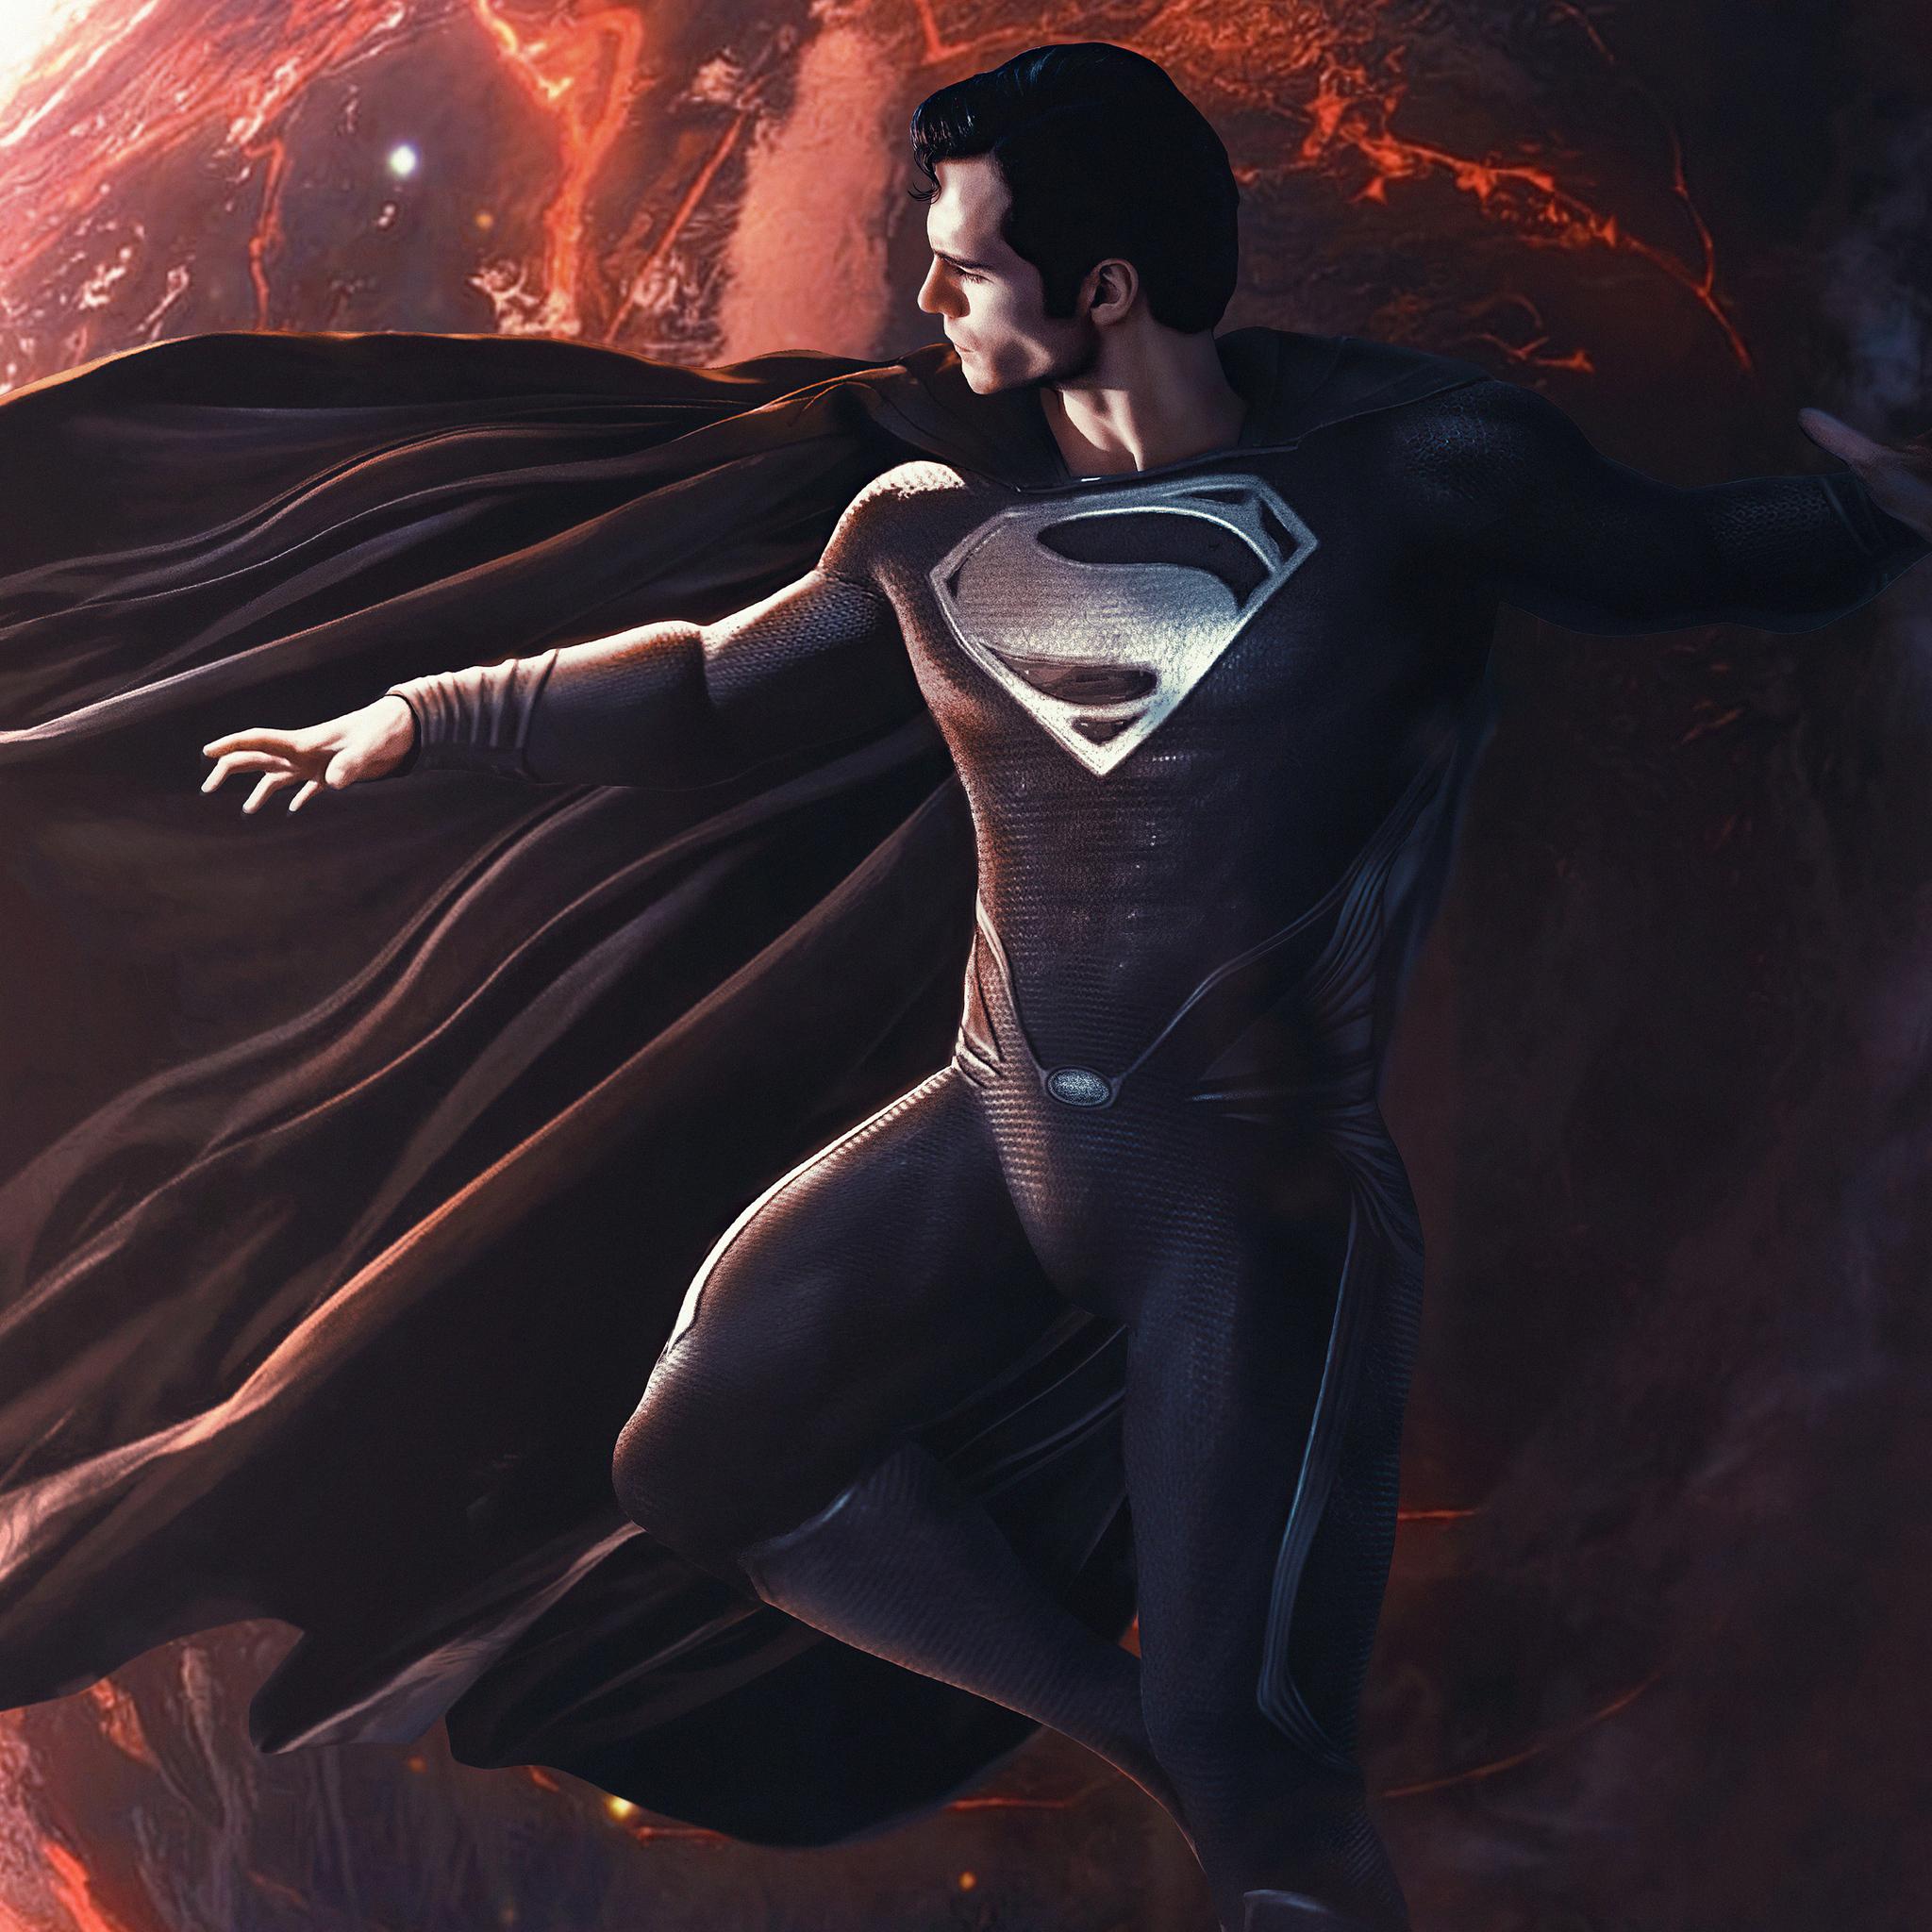 black-superman-5k-zr.jpg